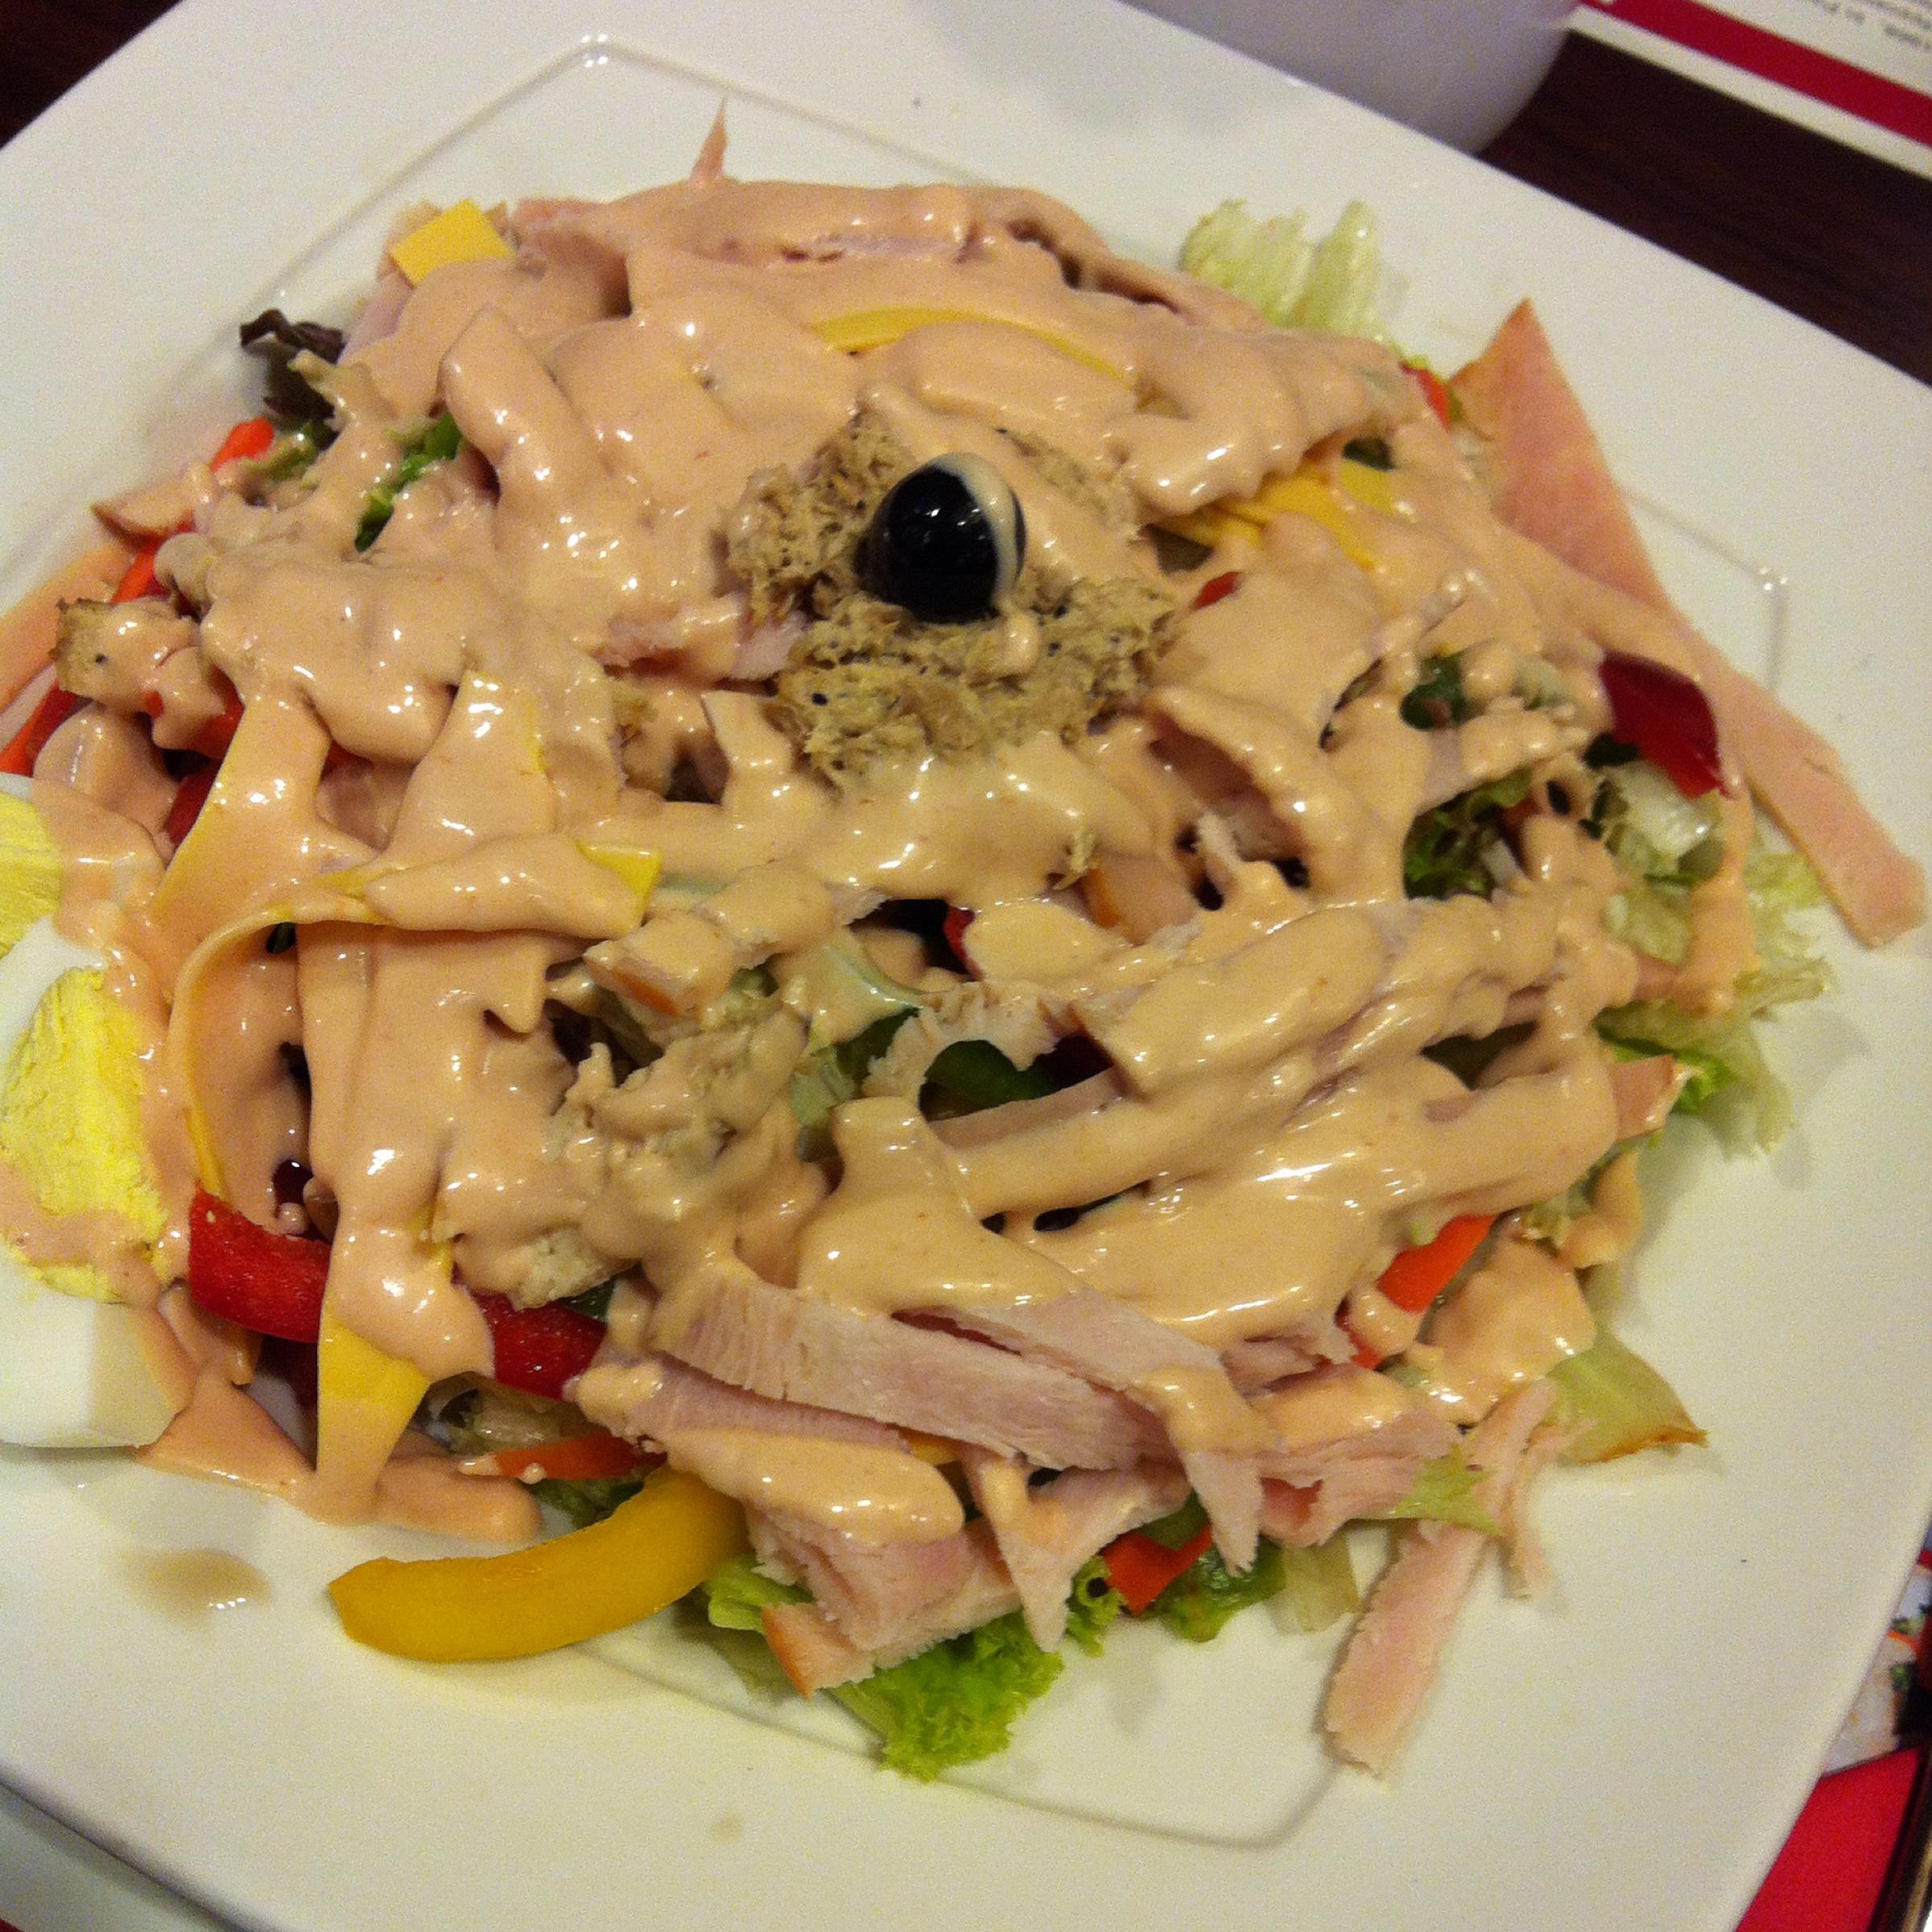 Hippopotamus restaurant grill menu abu dhabi airport abu dhabi foodspotting - Hippopotamus restaurant grill ...